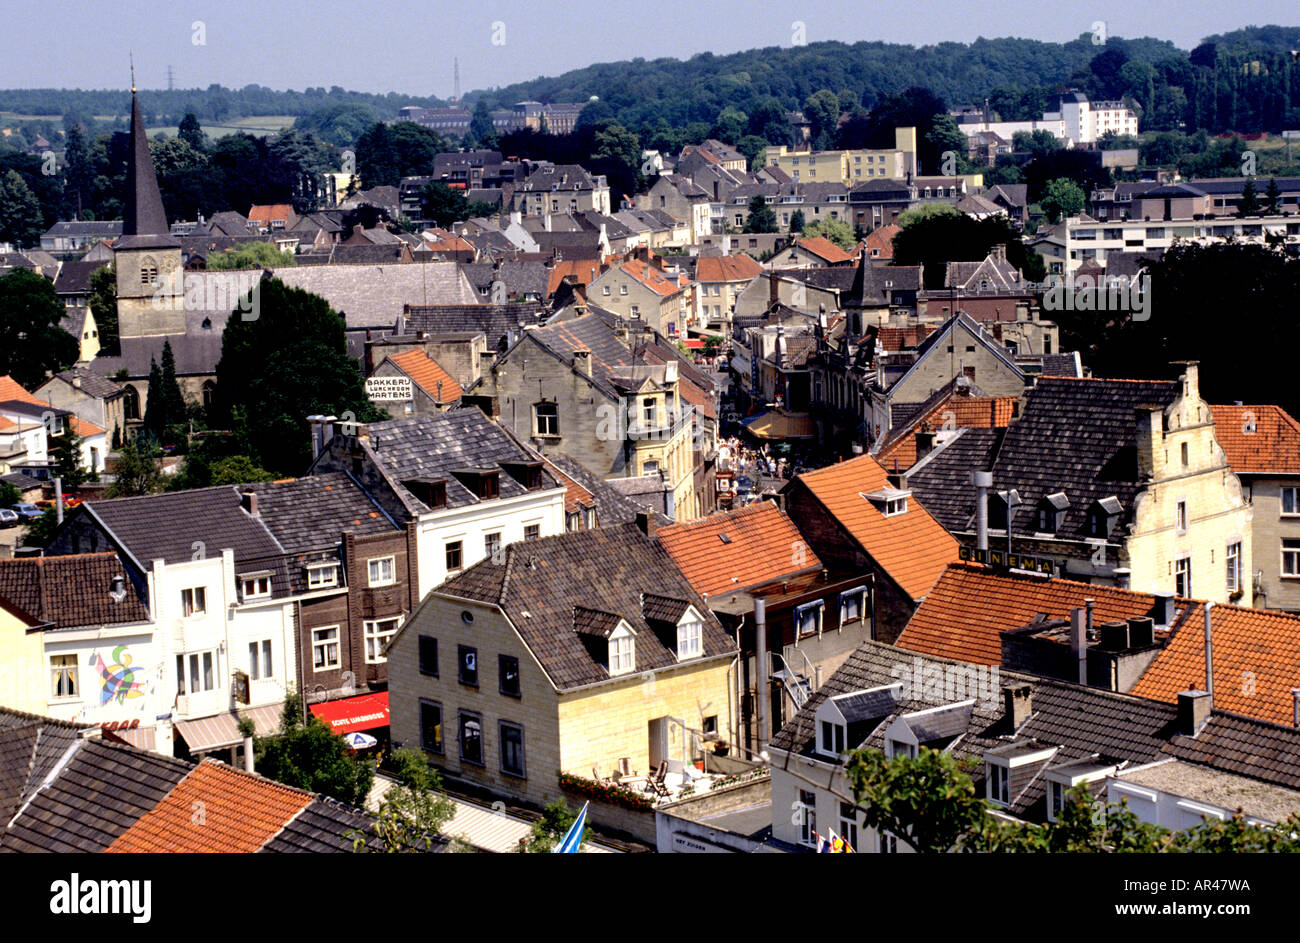 valkenburg limburg stockfotos valkenburg limburg bilder alamy. Black Bedroom Furniture Sets. Home Design Ideas